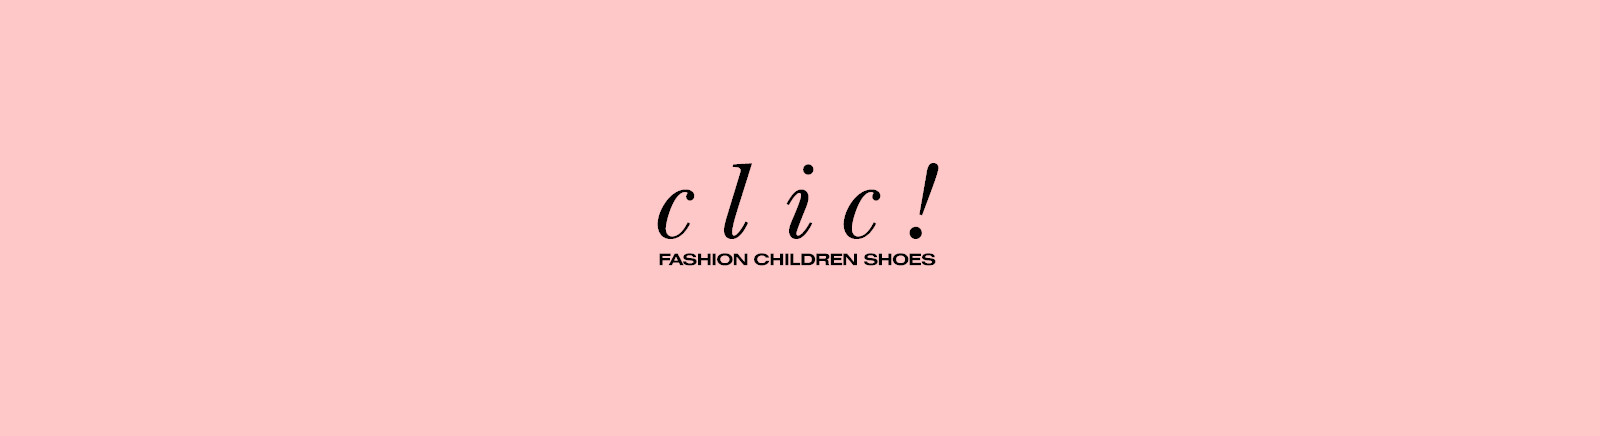 Juppen: Clic Shoes Lauflernschuhe für Kinder online shoppen